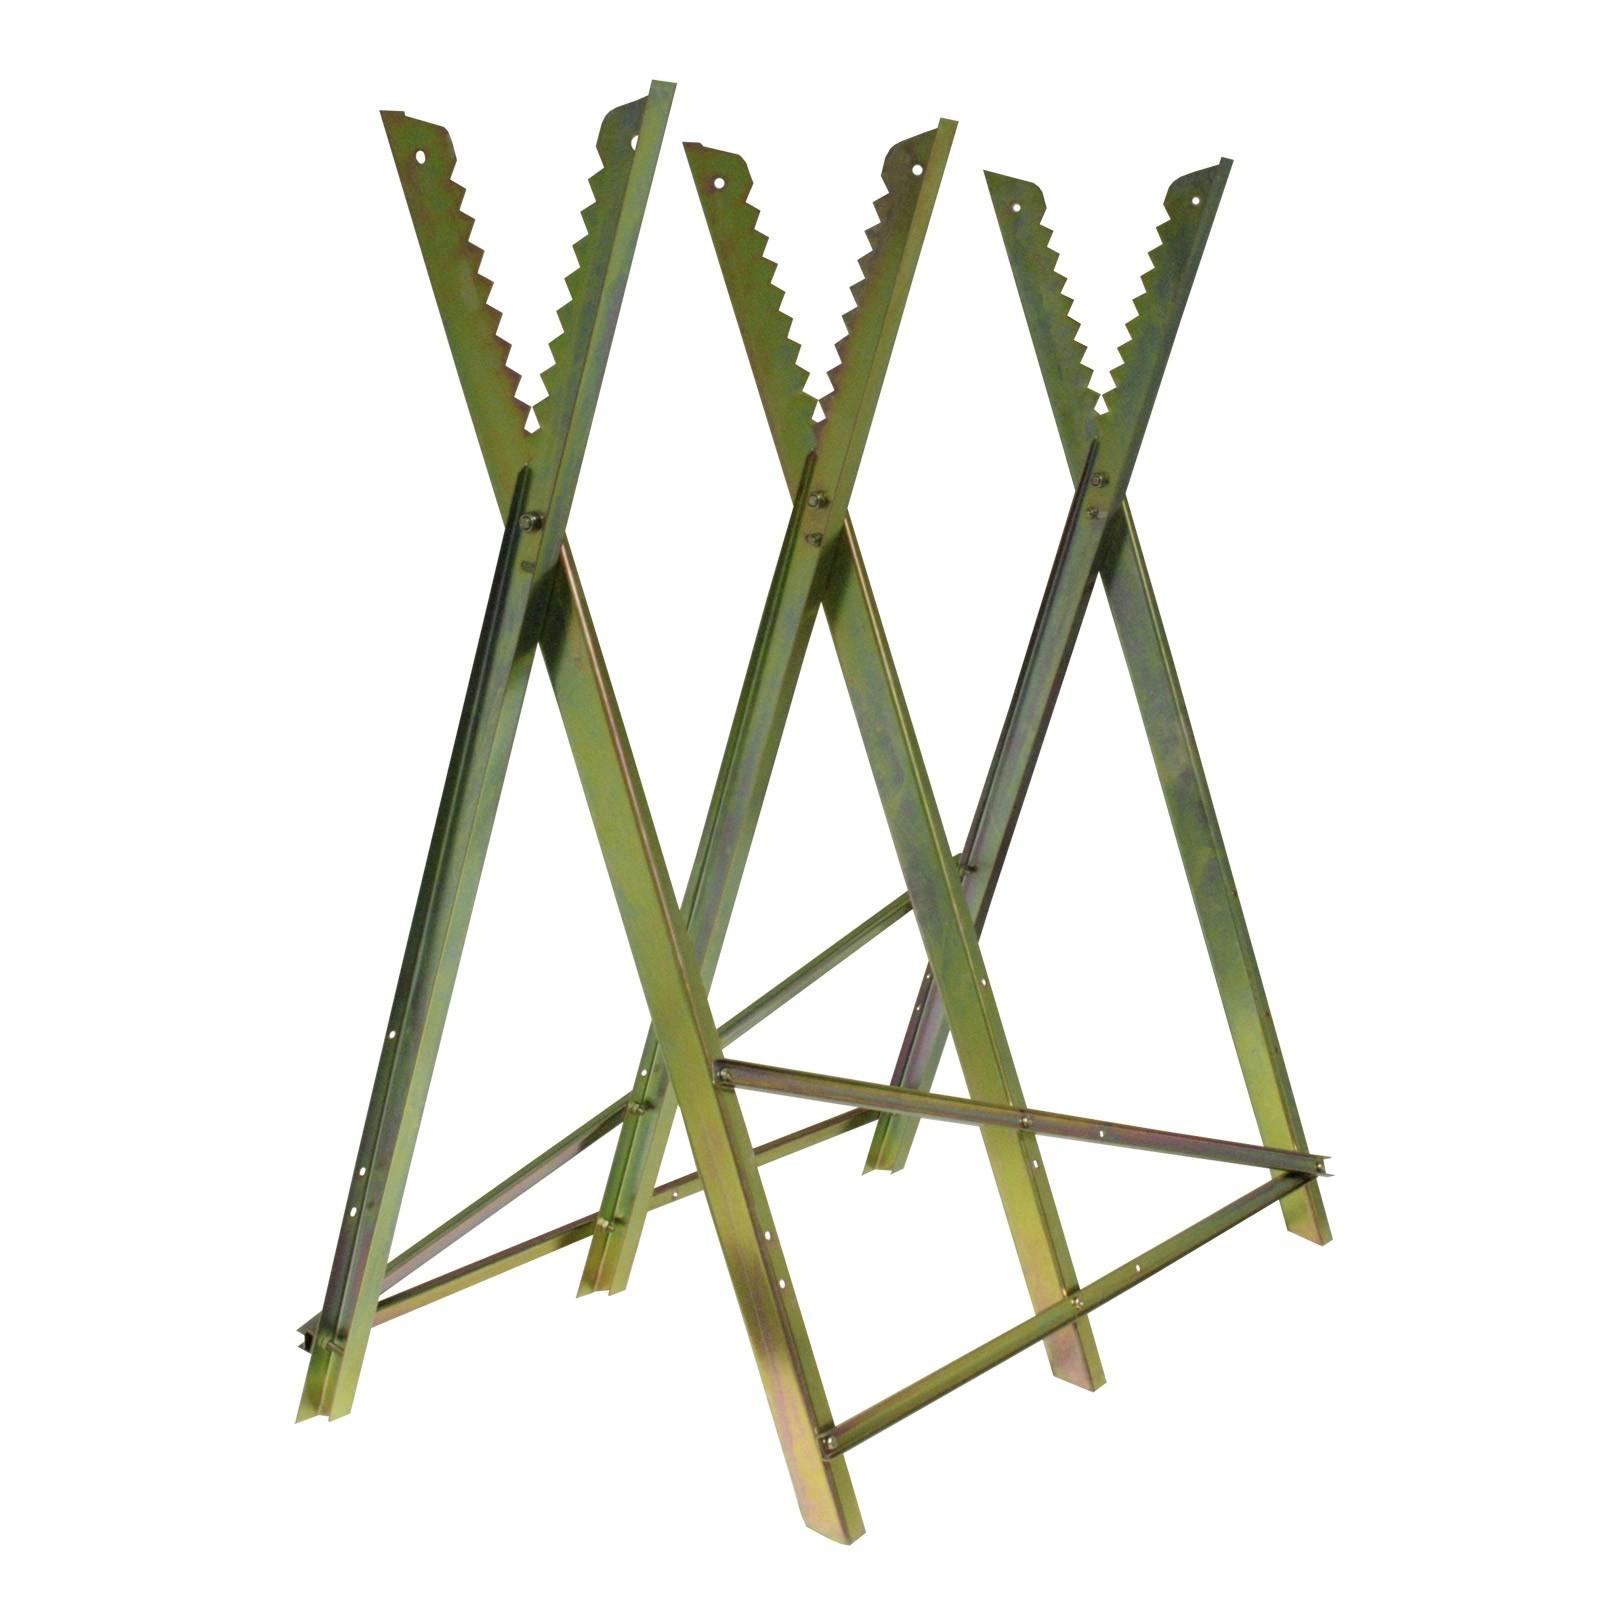 Metallsägebock / Sägebock, klappbar zum Sägen von Brennholz